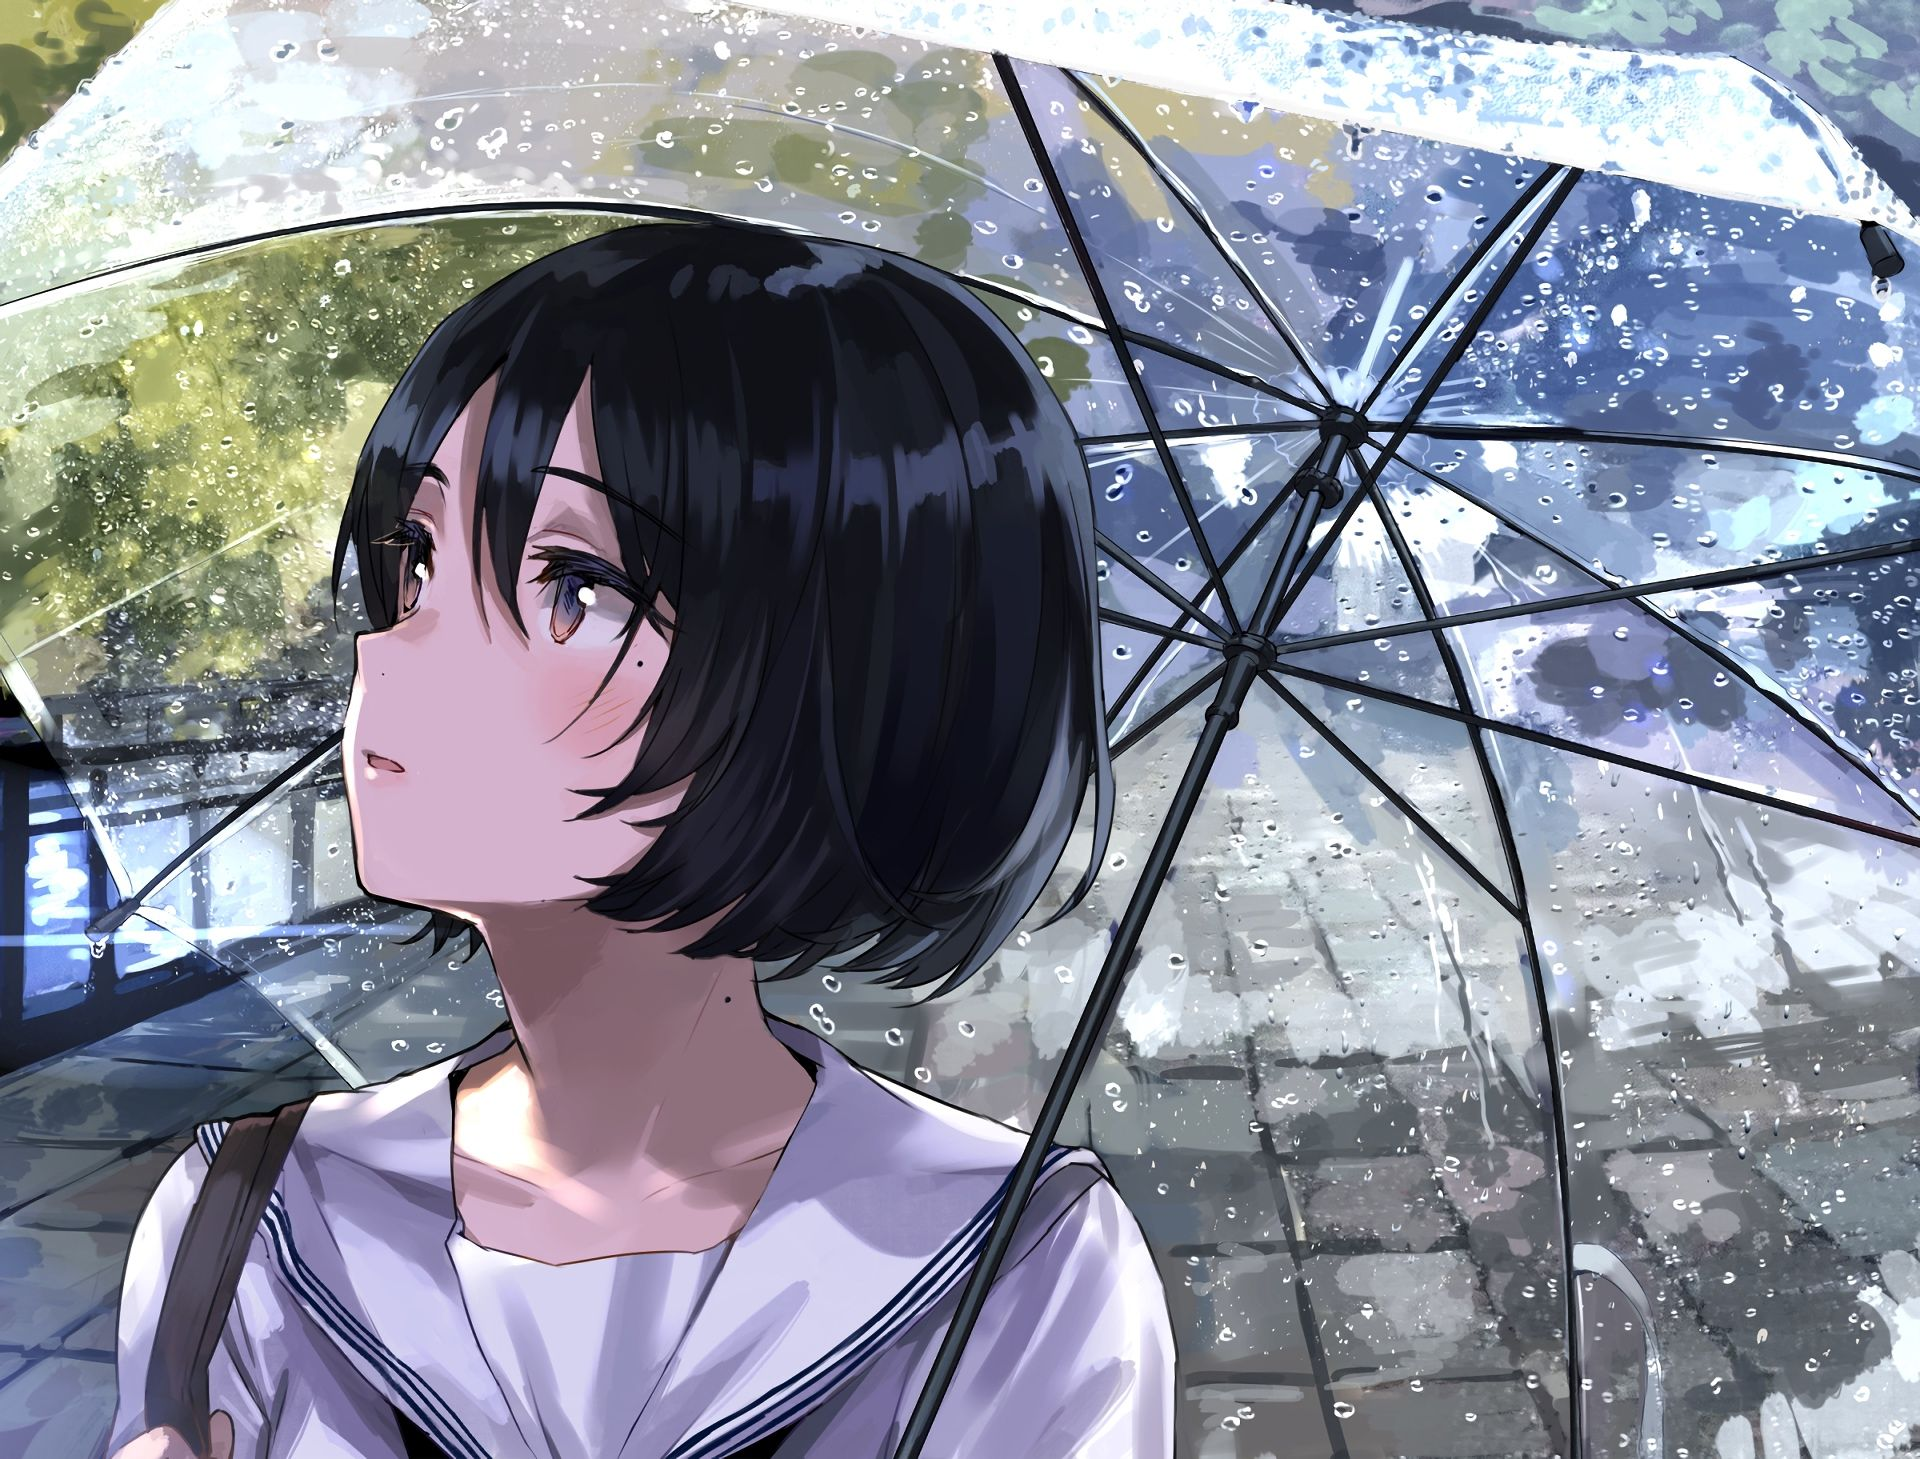 Umbrella Anime Girl Cute Rain Original Anime Wallpaper